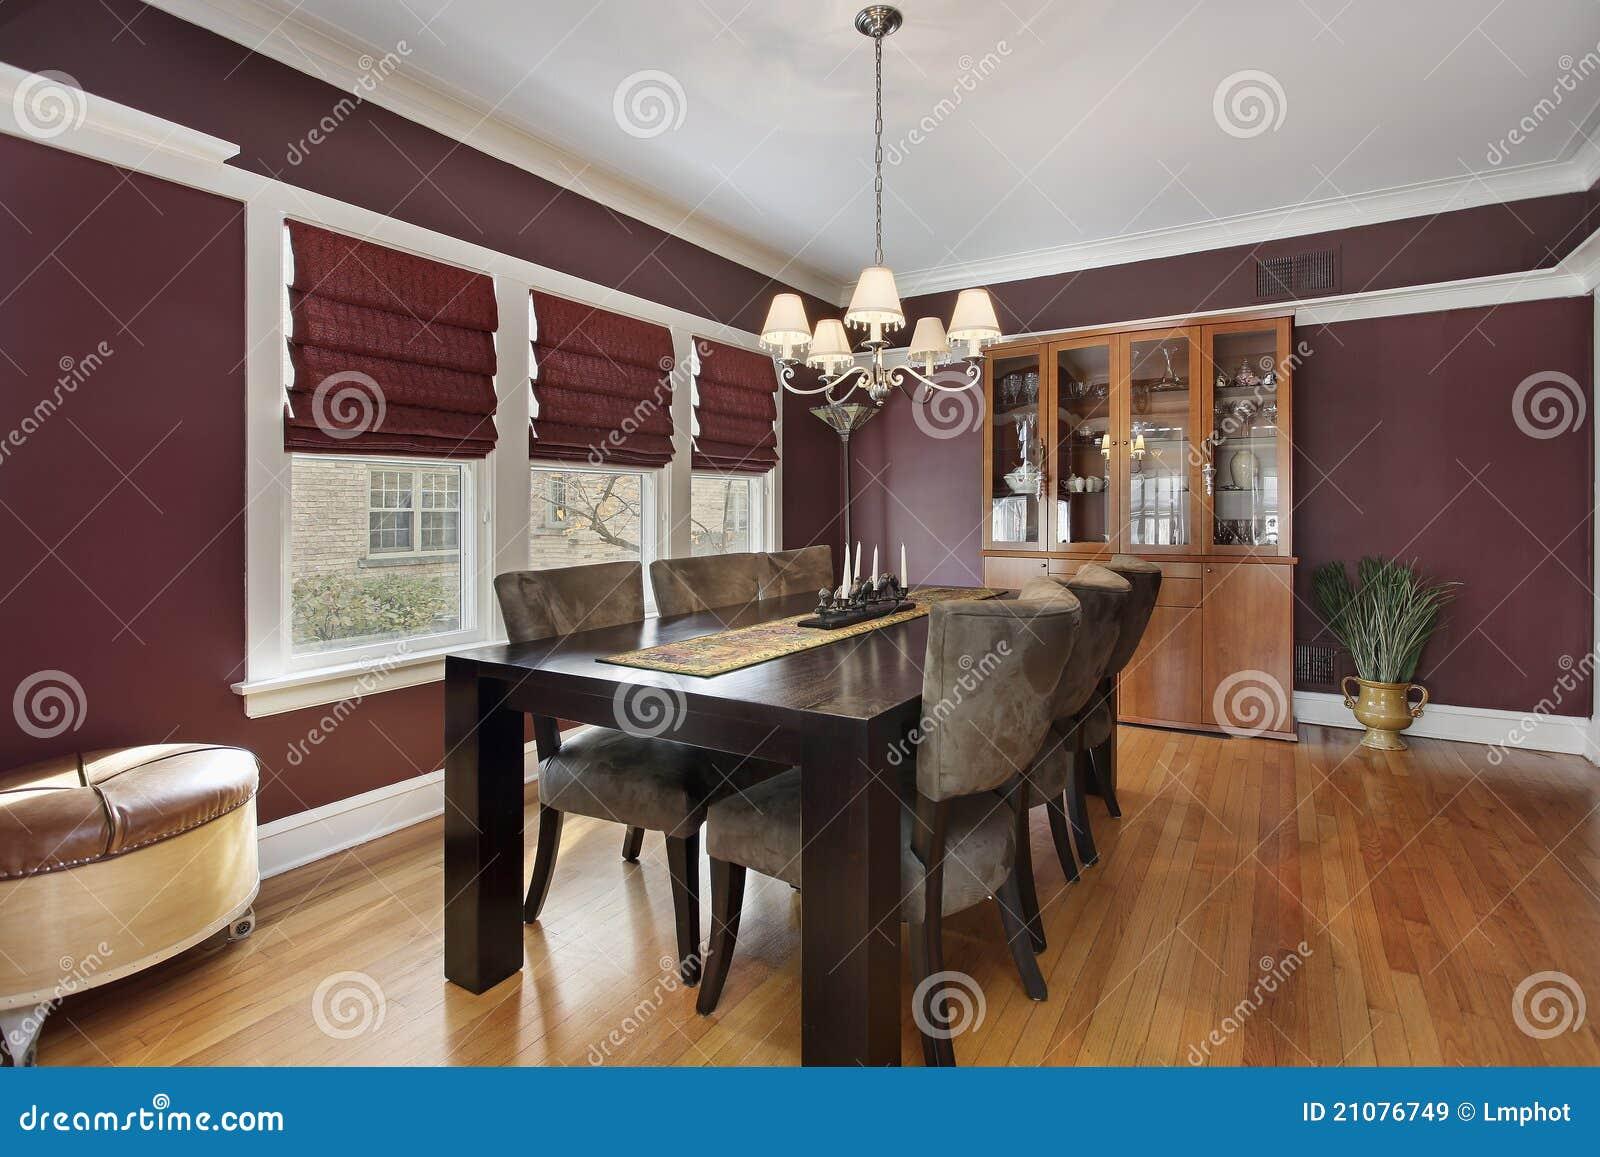 salle a manger beige clair salle a manger complete contemporaine - Salle A Manger Beige Clair